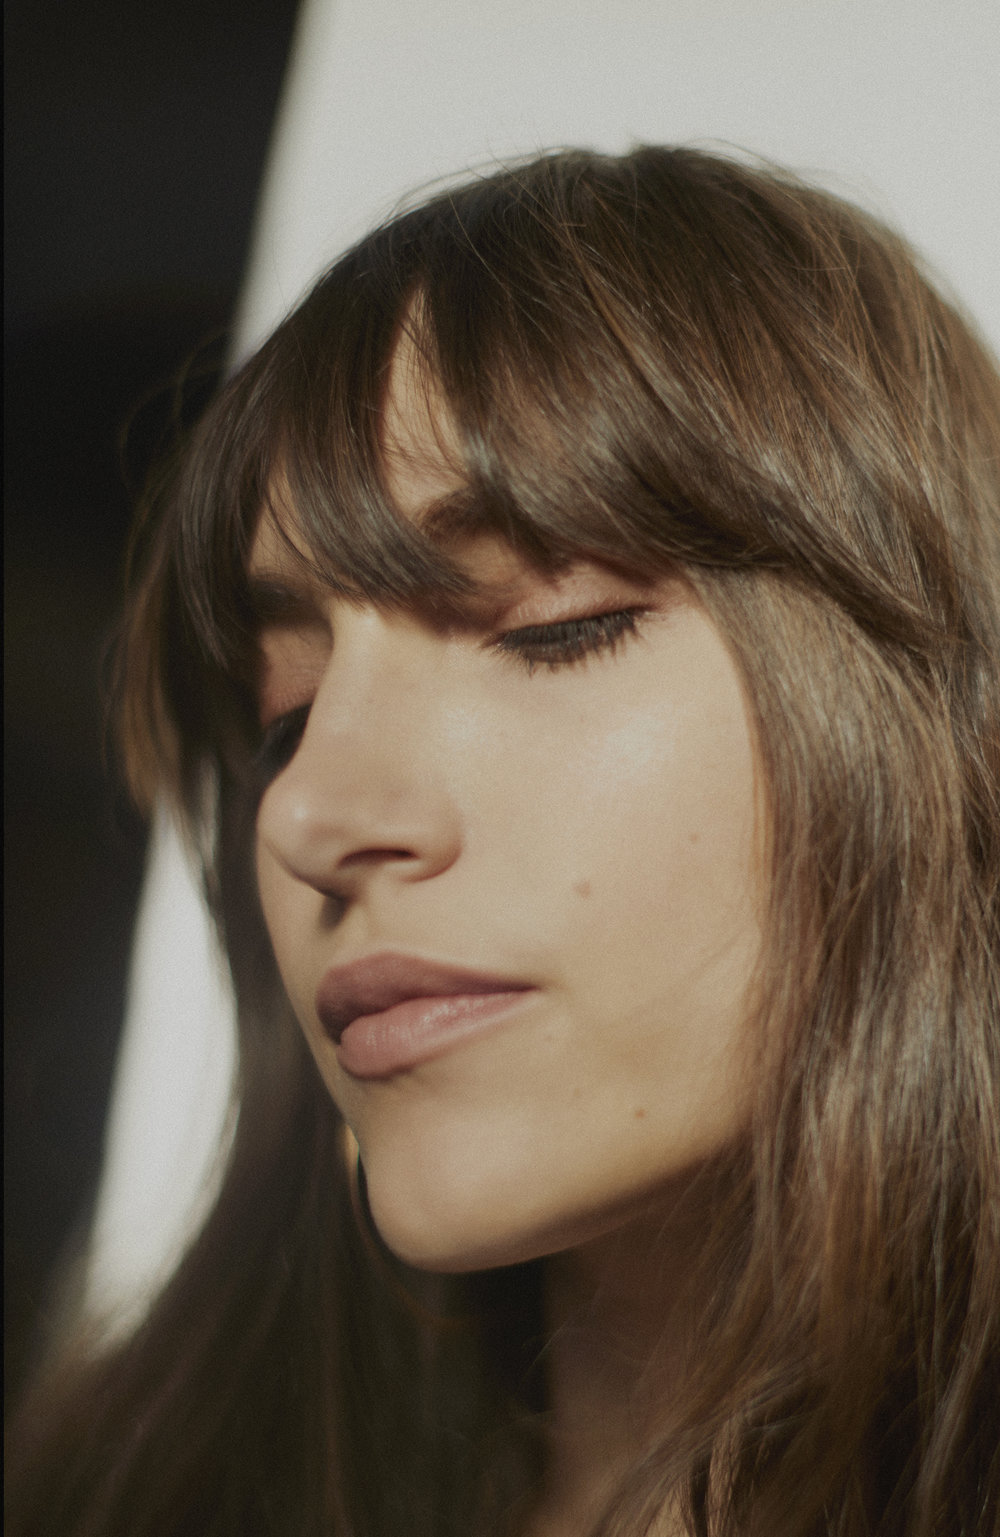 Bershka Beauty - MERCEDES OLLER (15).jpg